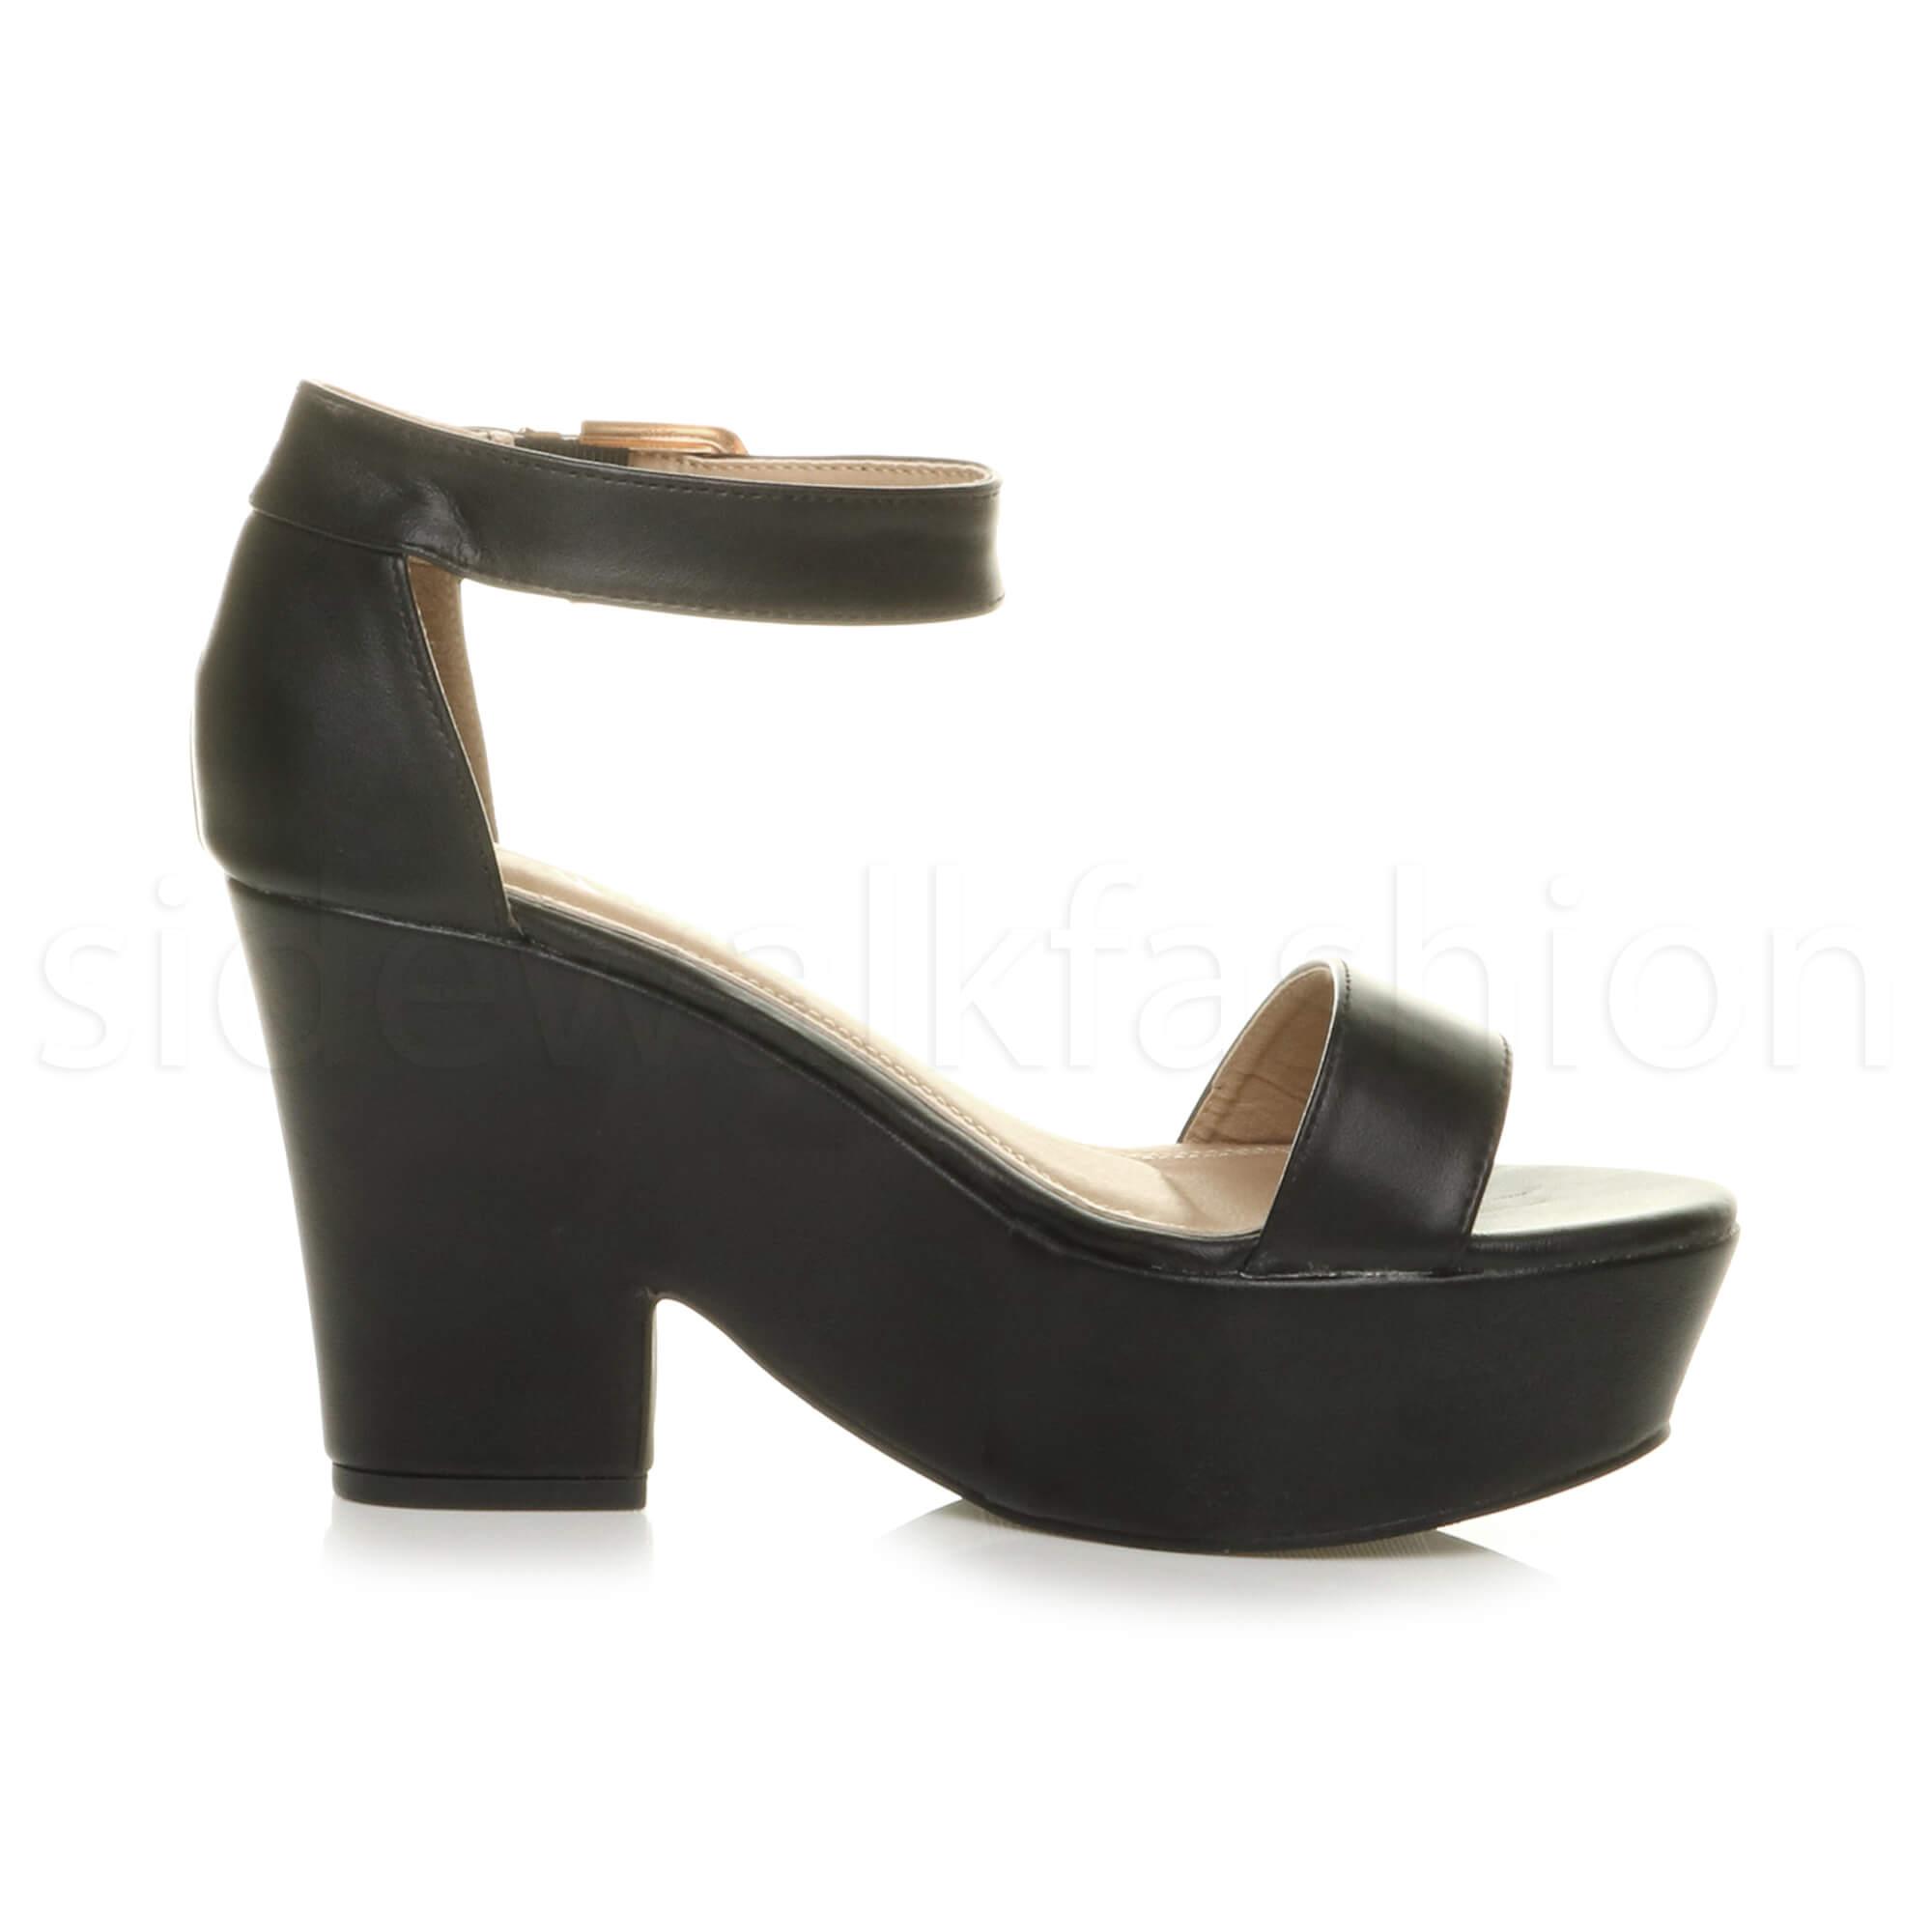 0edffdf4e14 Womens ladies platform high block heel semi wedge peep toe shoes ...